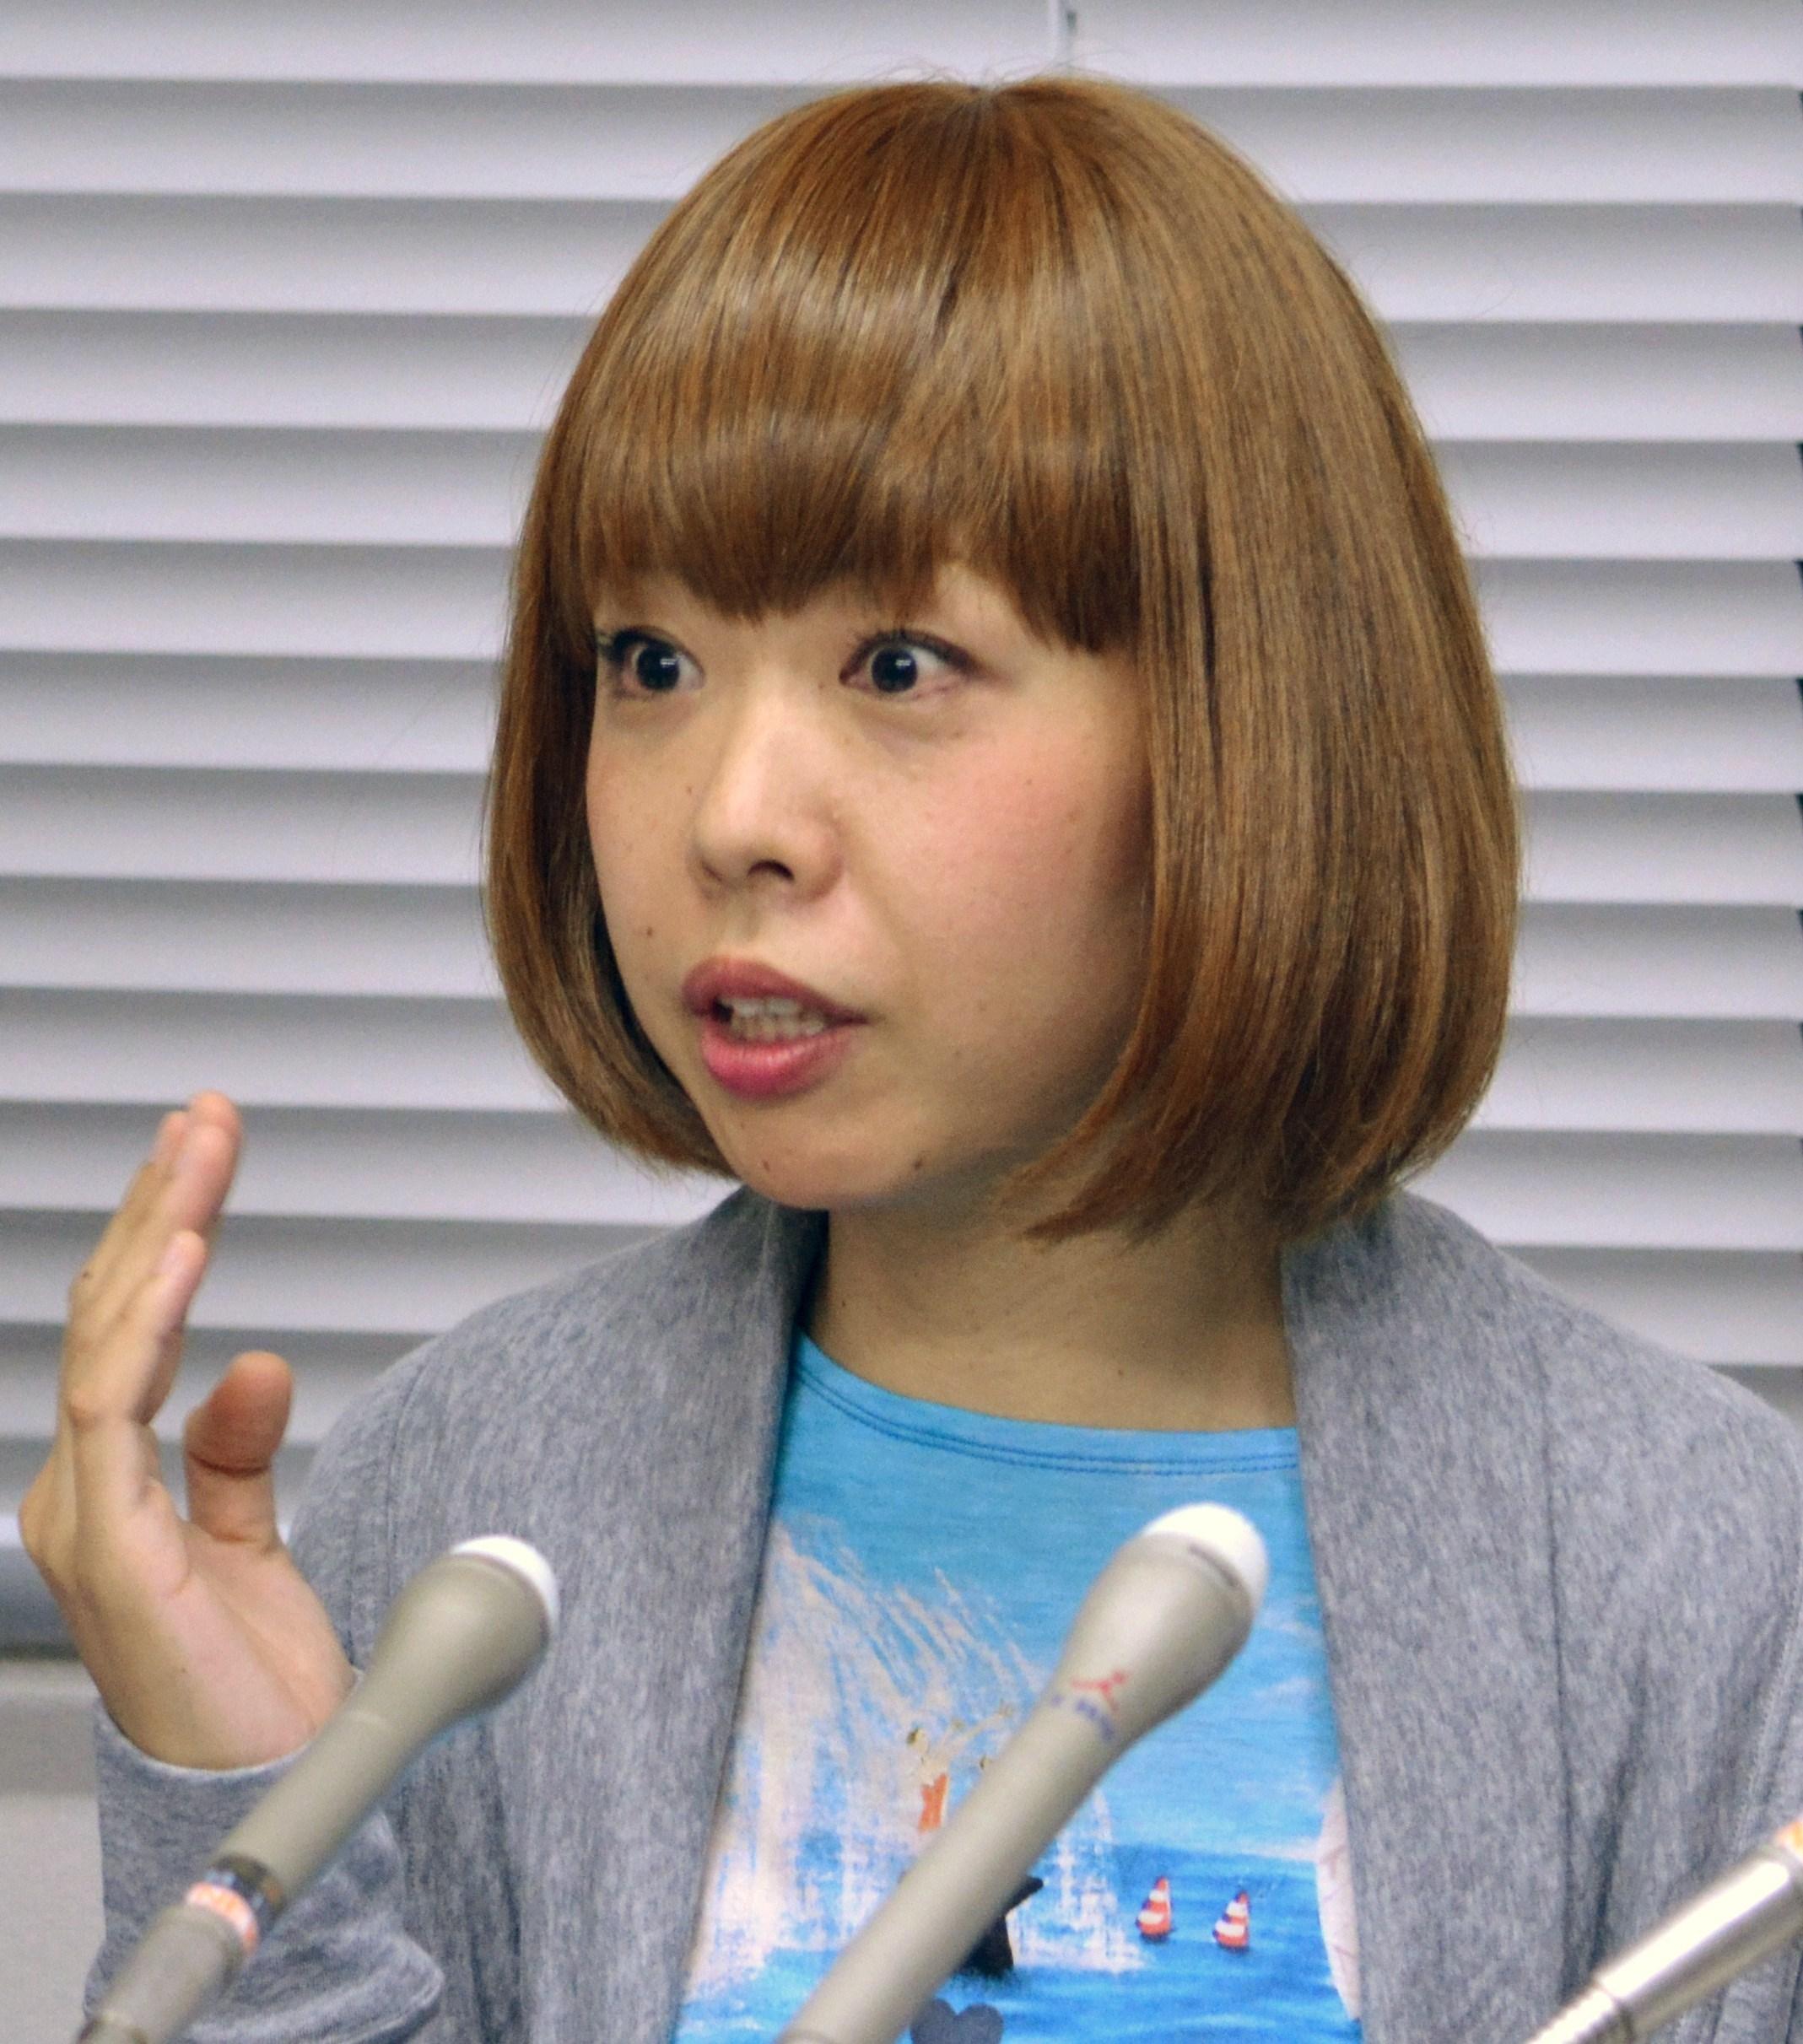 Japanese Artist Indicted For 'Vagina Kayak'